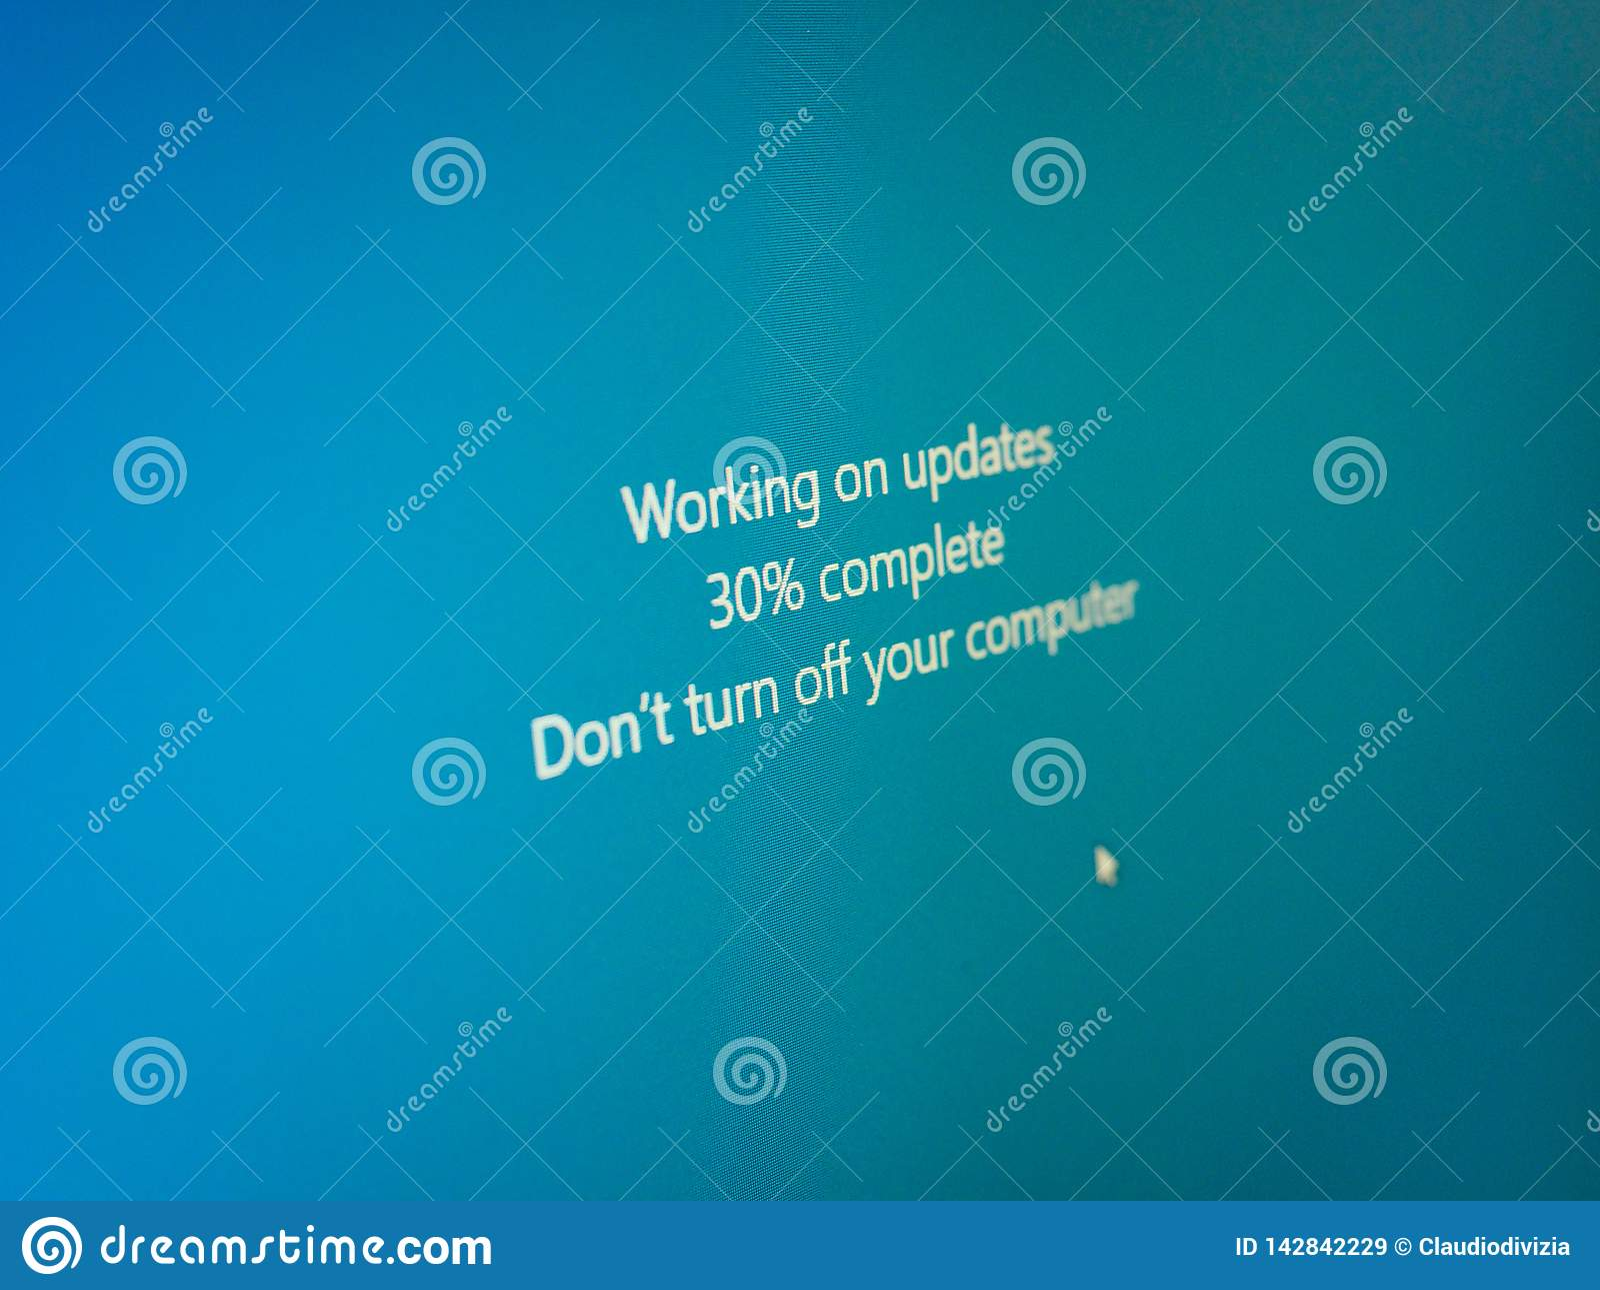 Windows update message stock illustration  Illustration of